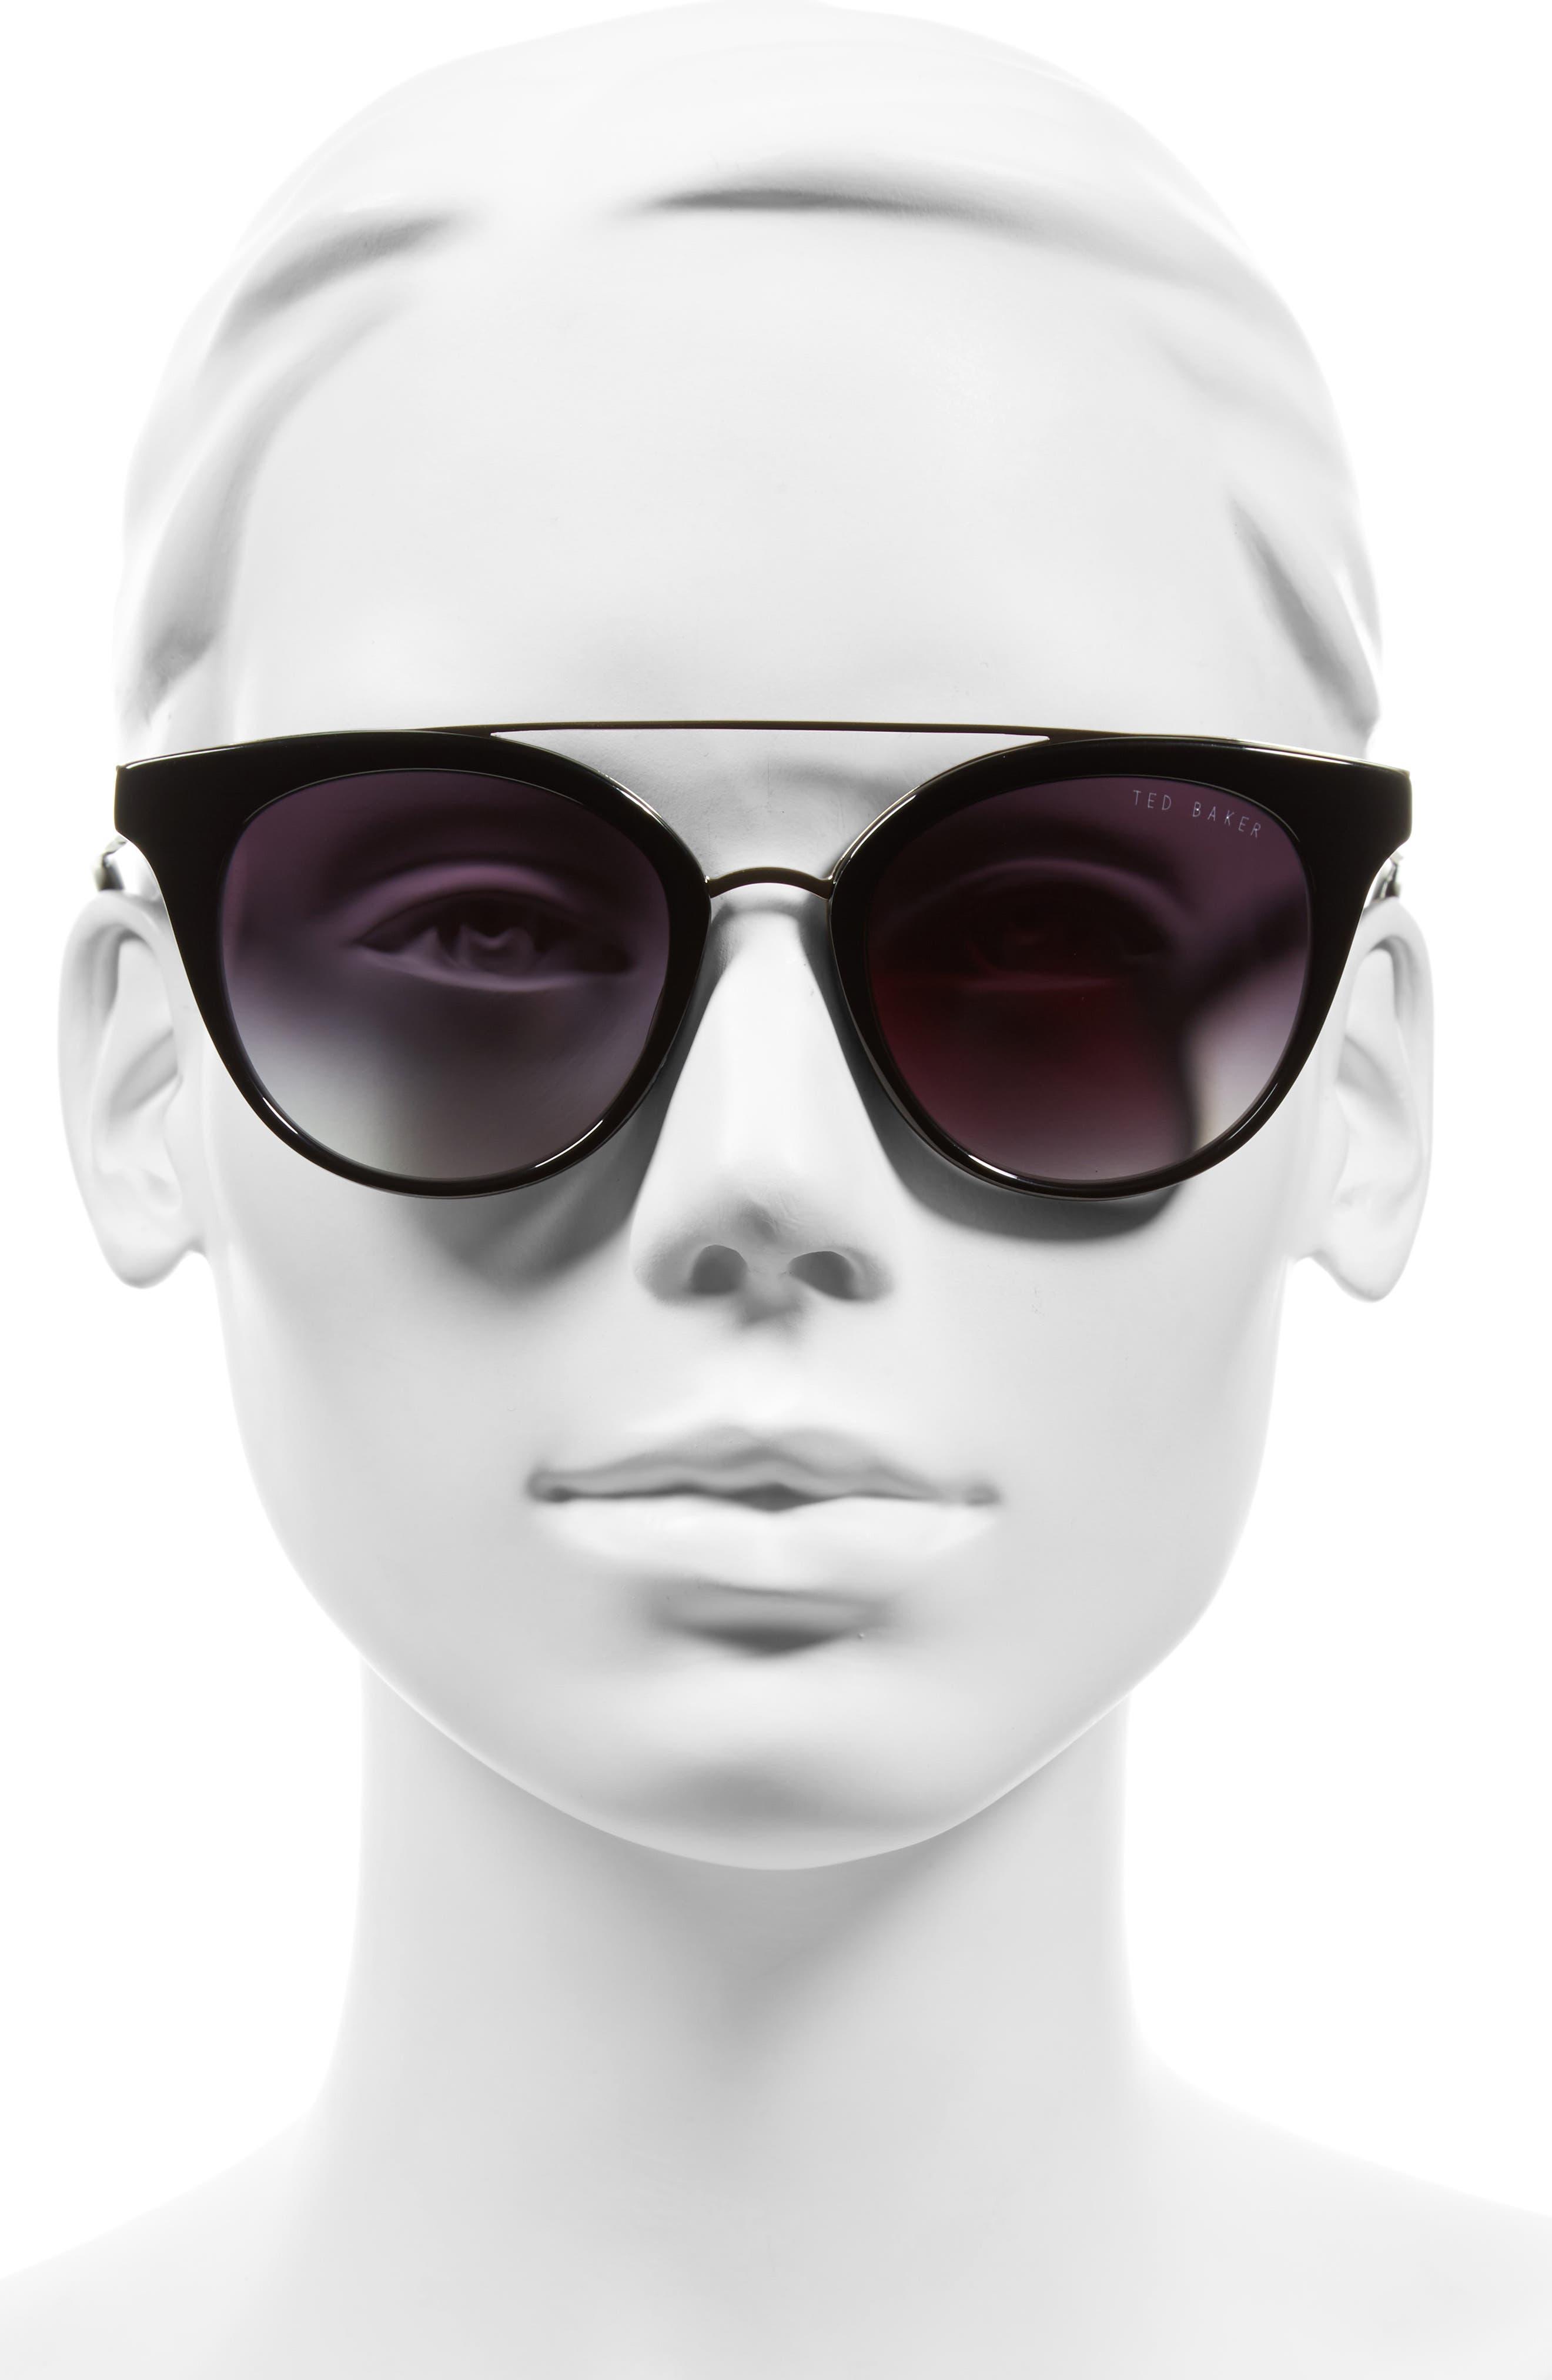 51mm Gradient Lens Round Retro Sunglasses,                             Alternate thumbnail 2, color,                             001